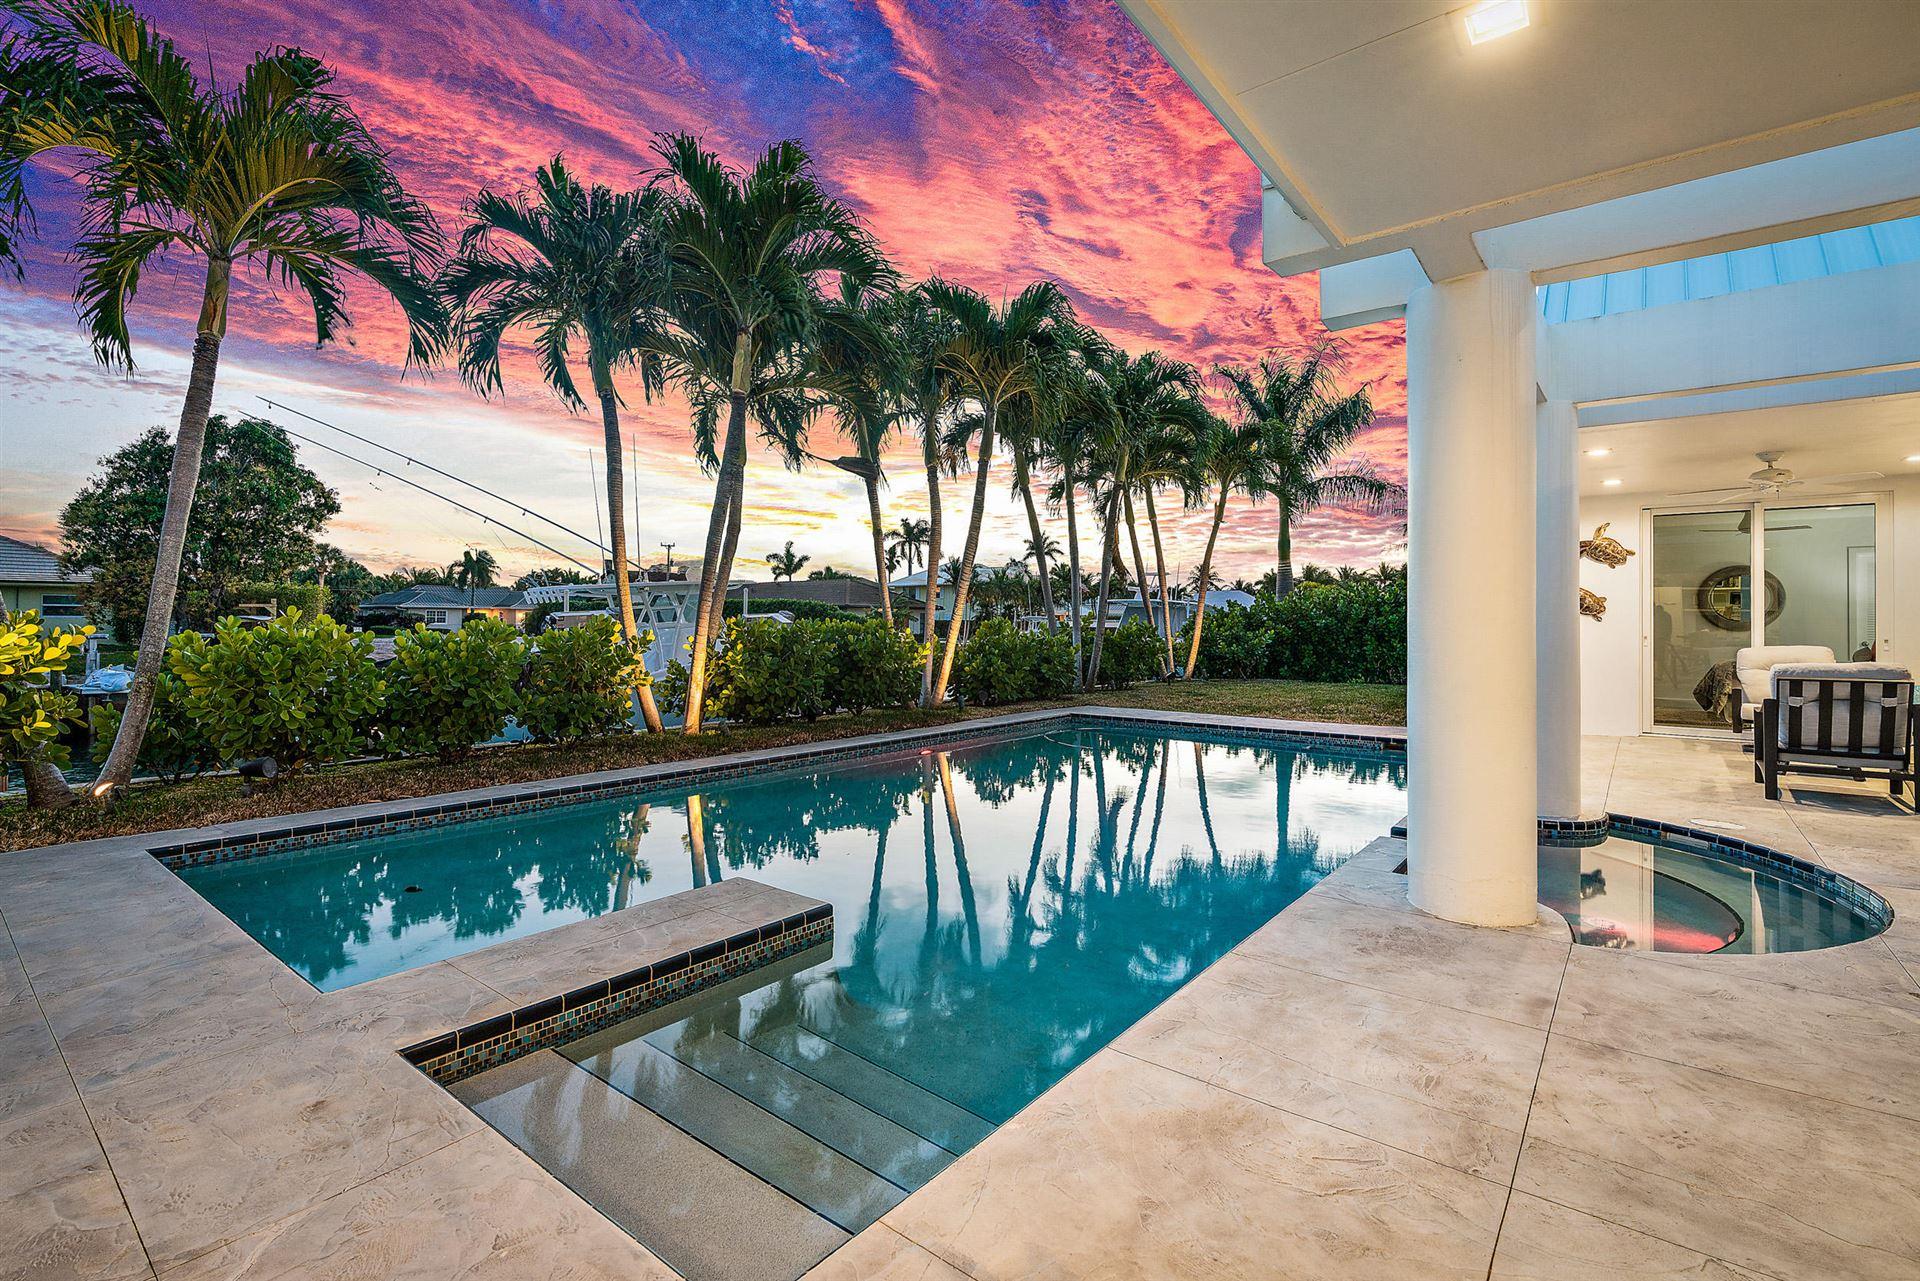 Photo of 1091 Grand Bahama Lane, Riviera Beach, FL 33404 (MLS # RX-10689037)